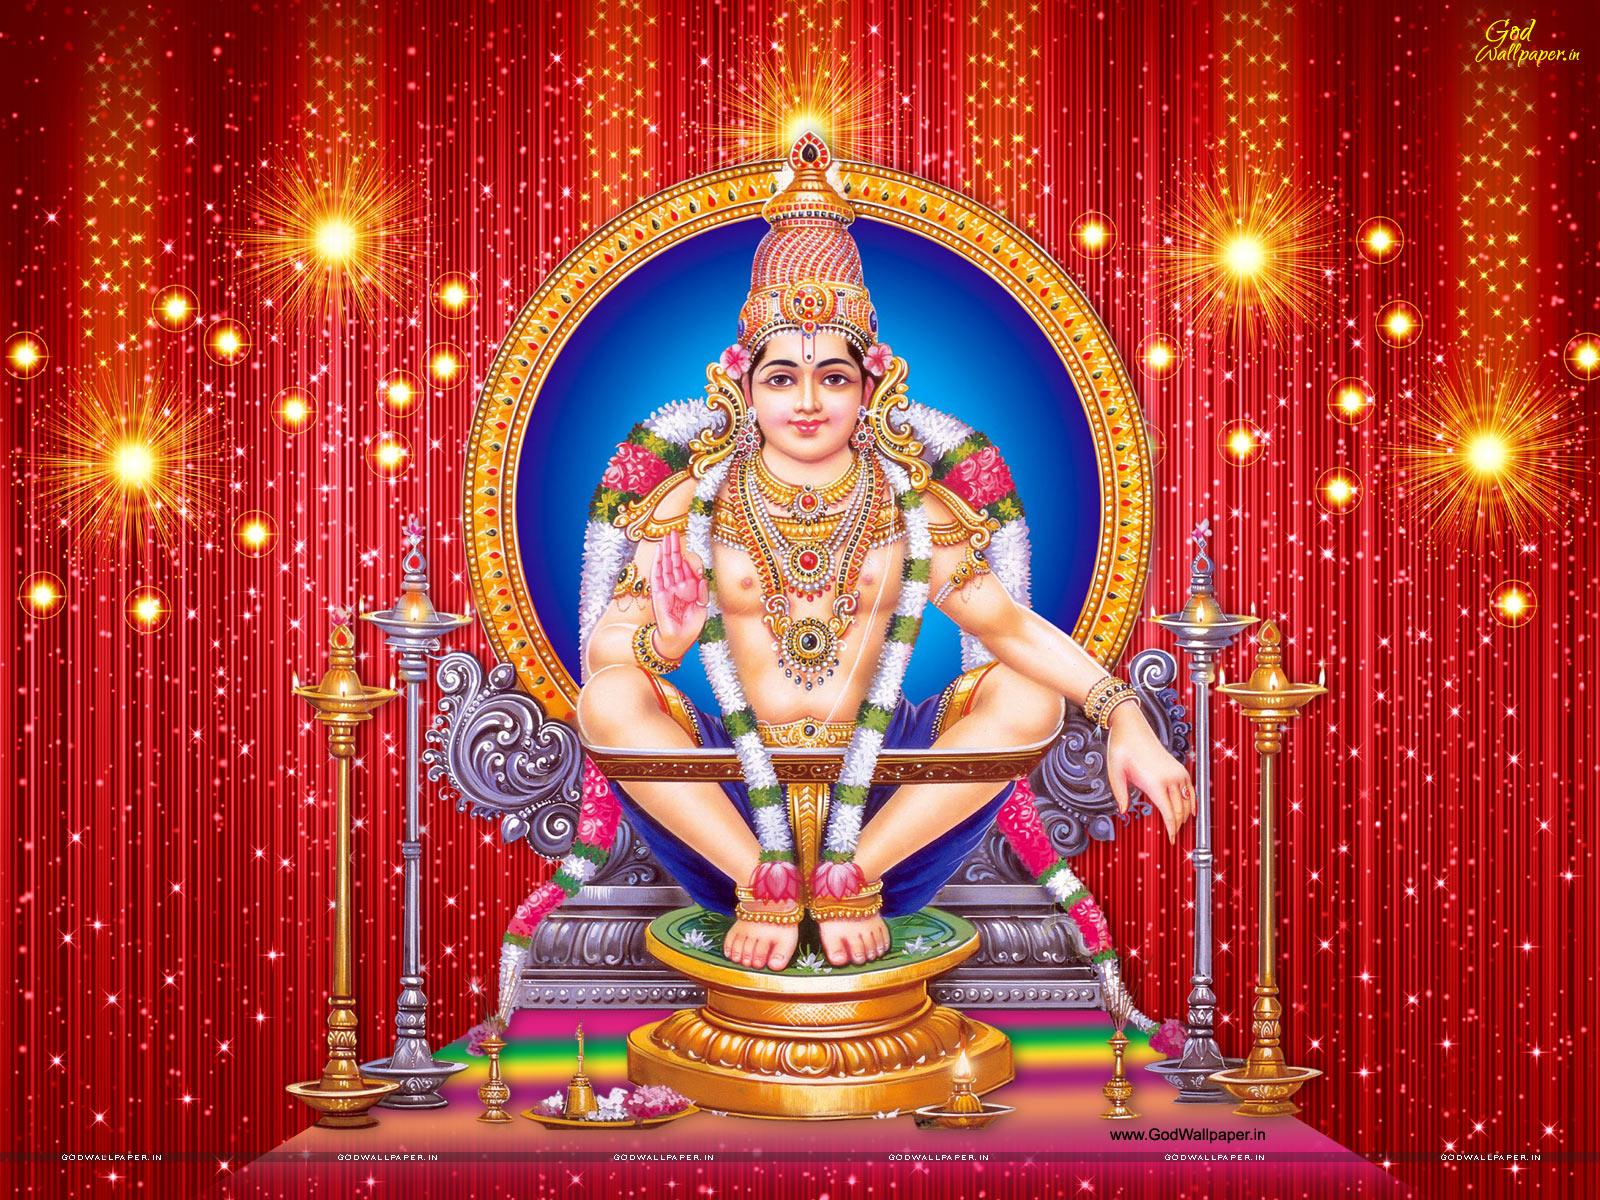 ayyappan songs tamil mp3 free download tamilwire